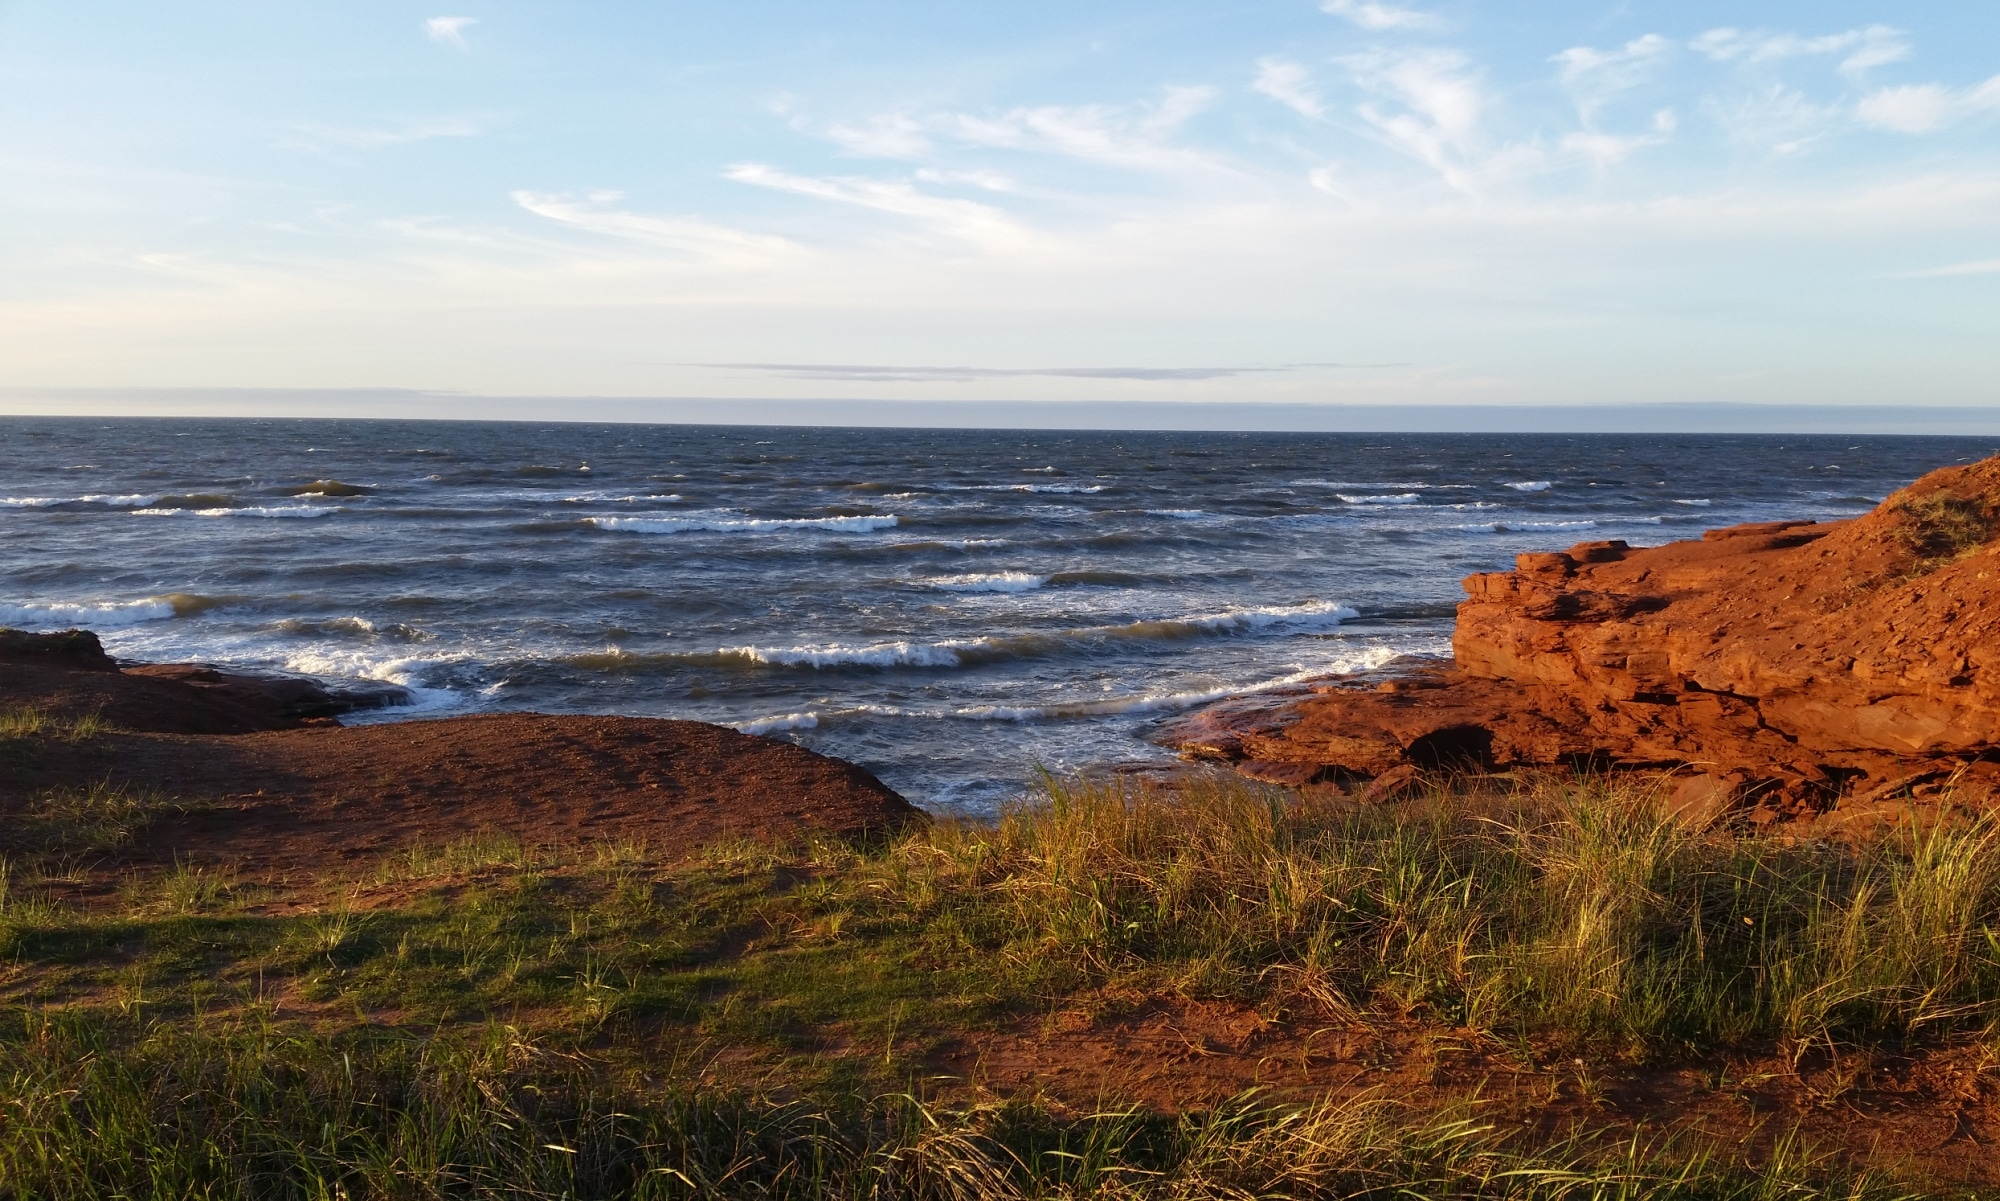 Ocean-view-20160528_191752